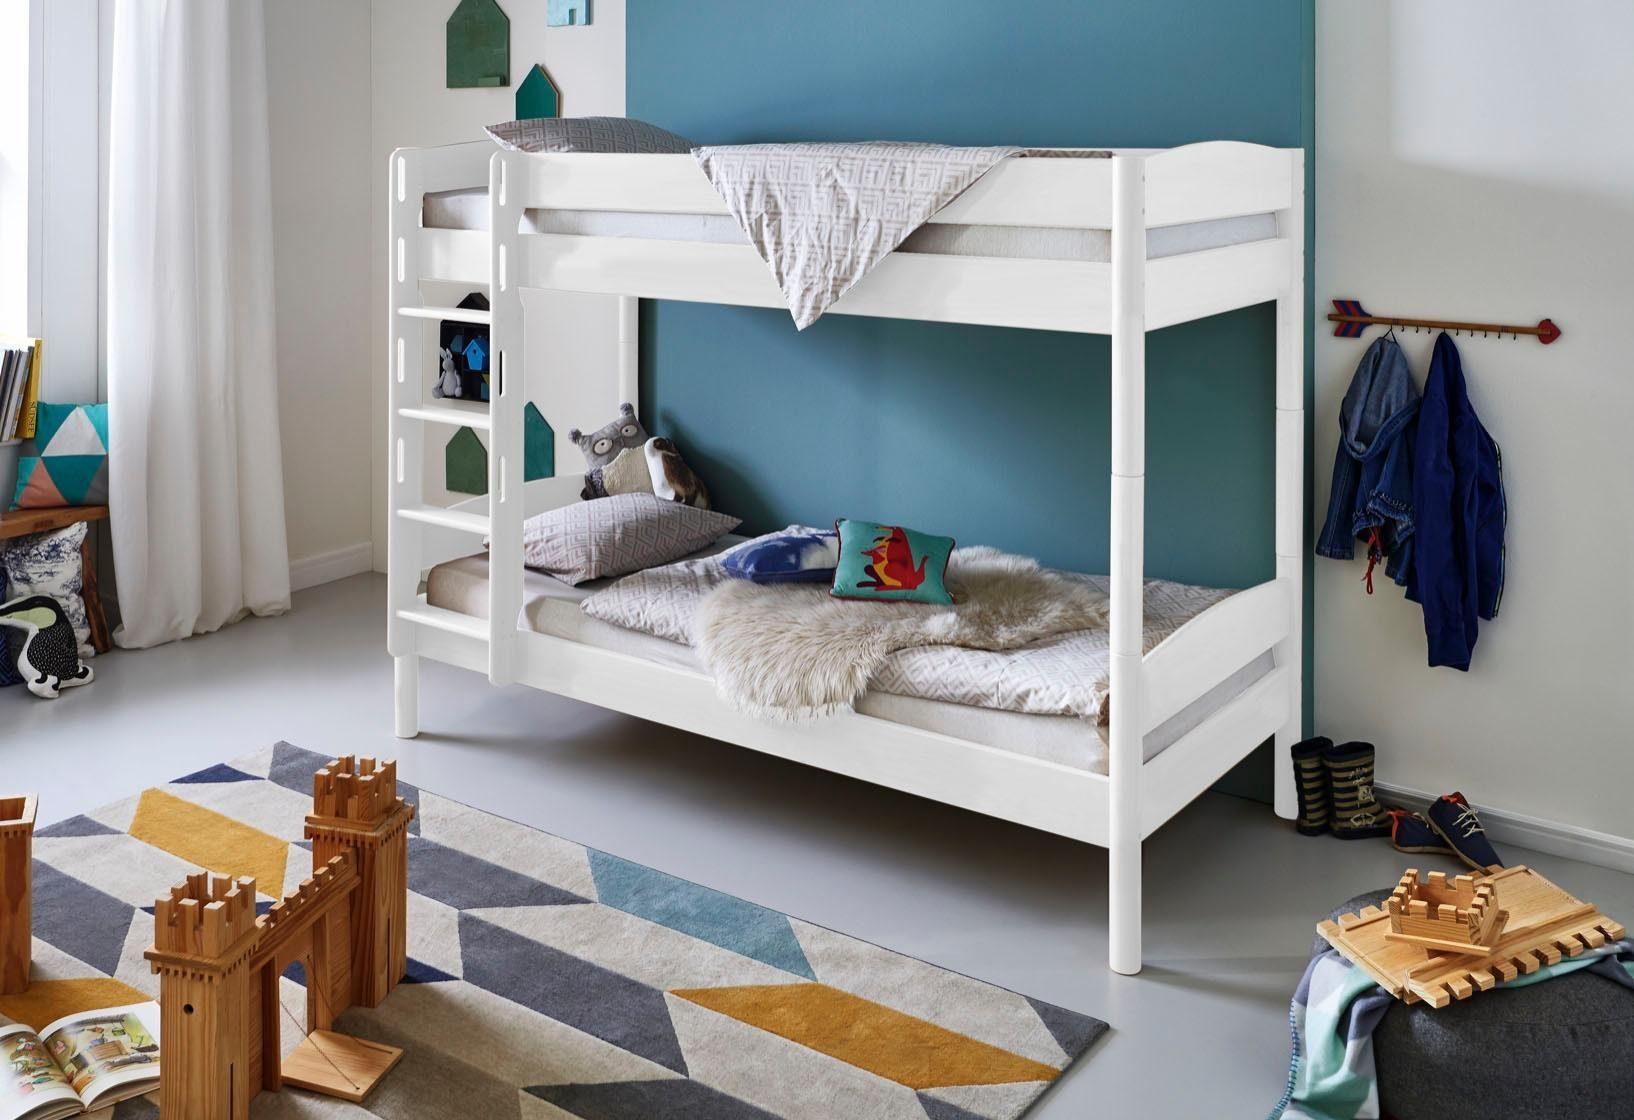 Etagenbett Kiefer Oder Buche : Kinderbett hochbett samuel buche vollholz massiv mit rutsche natur